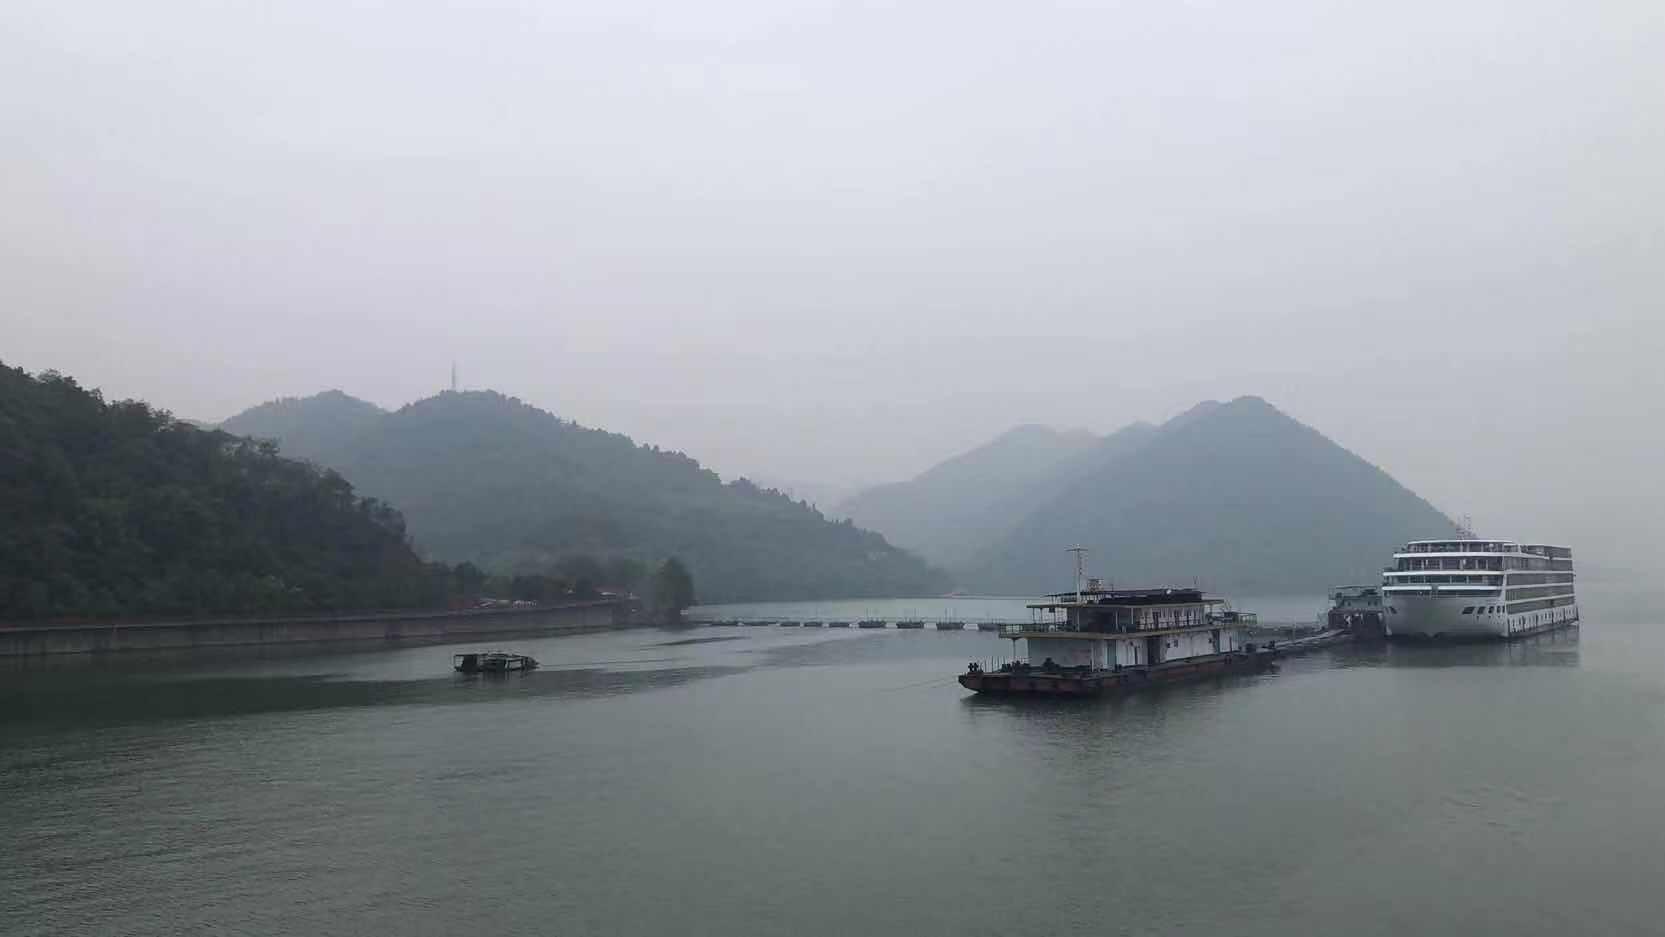 The sight along the Yangtze River